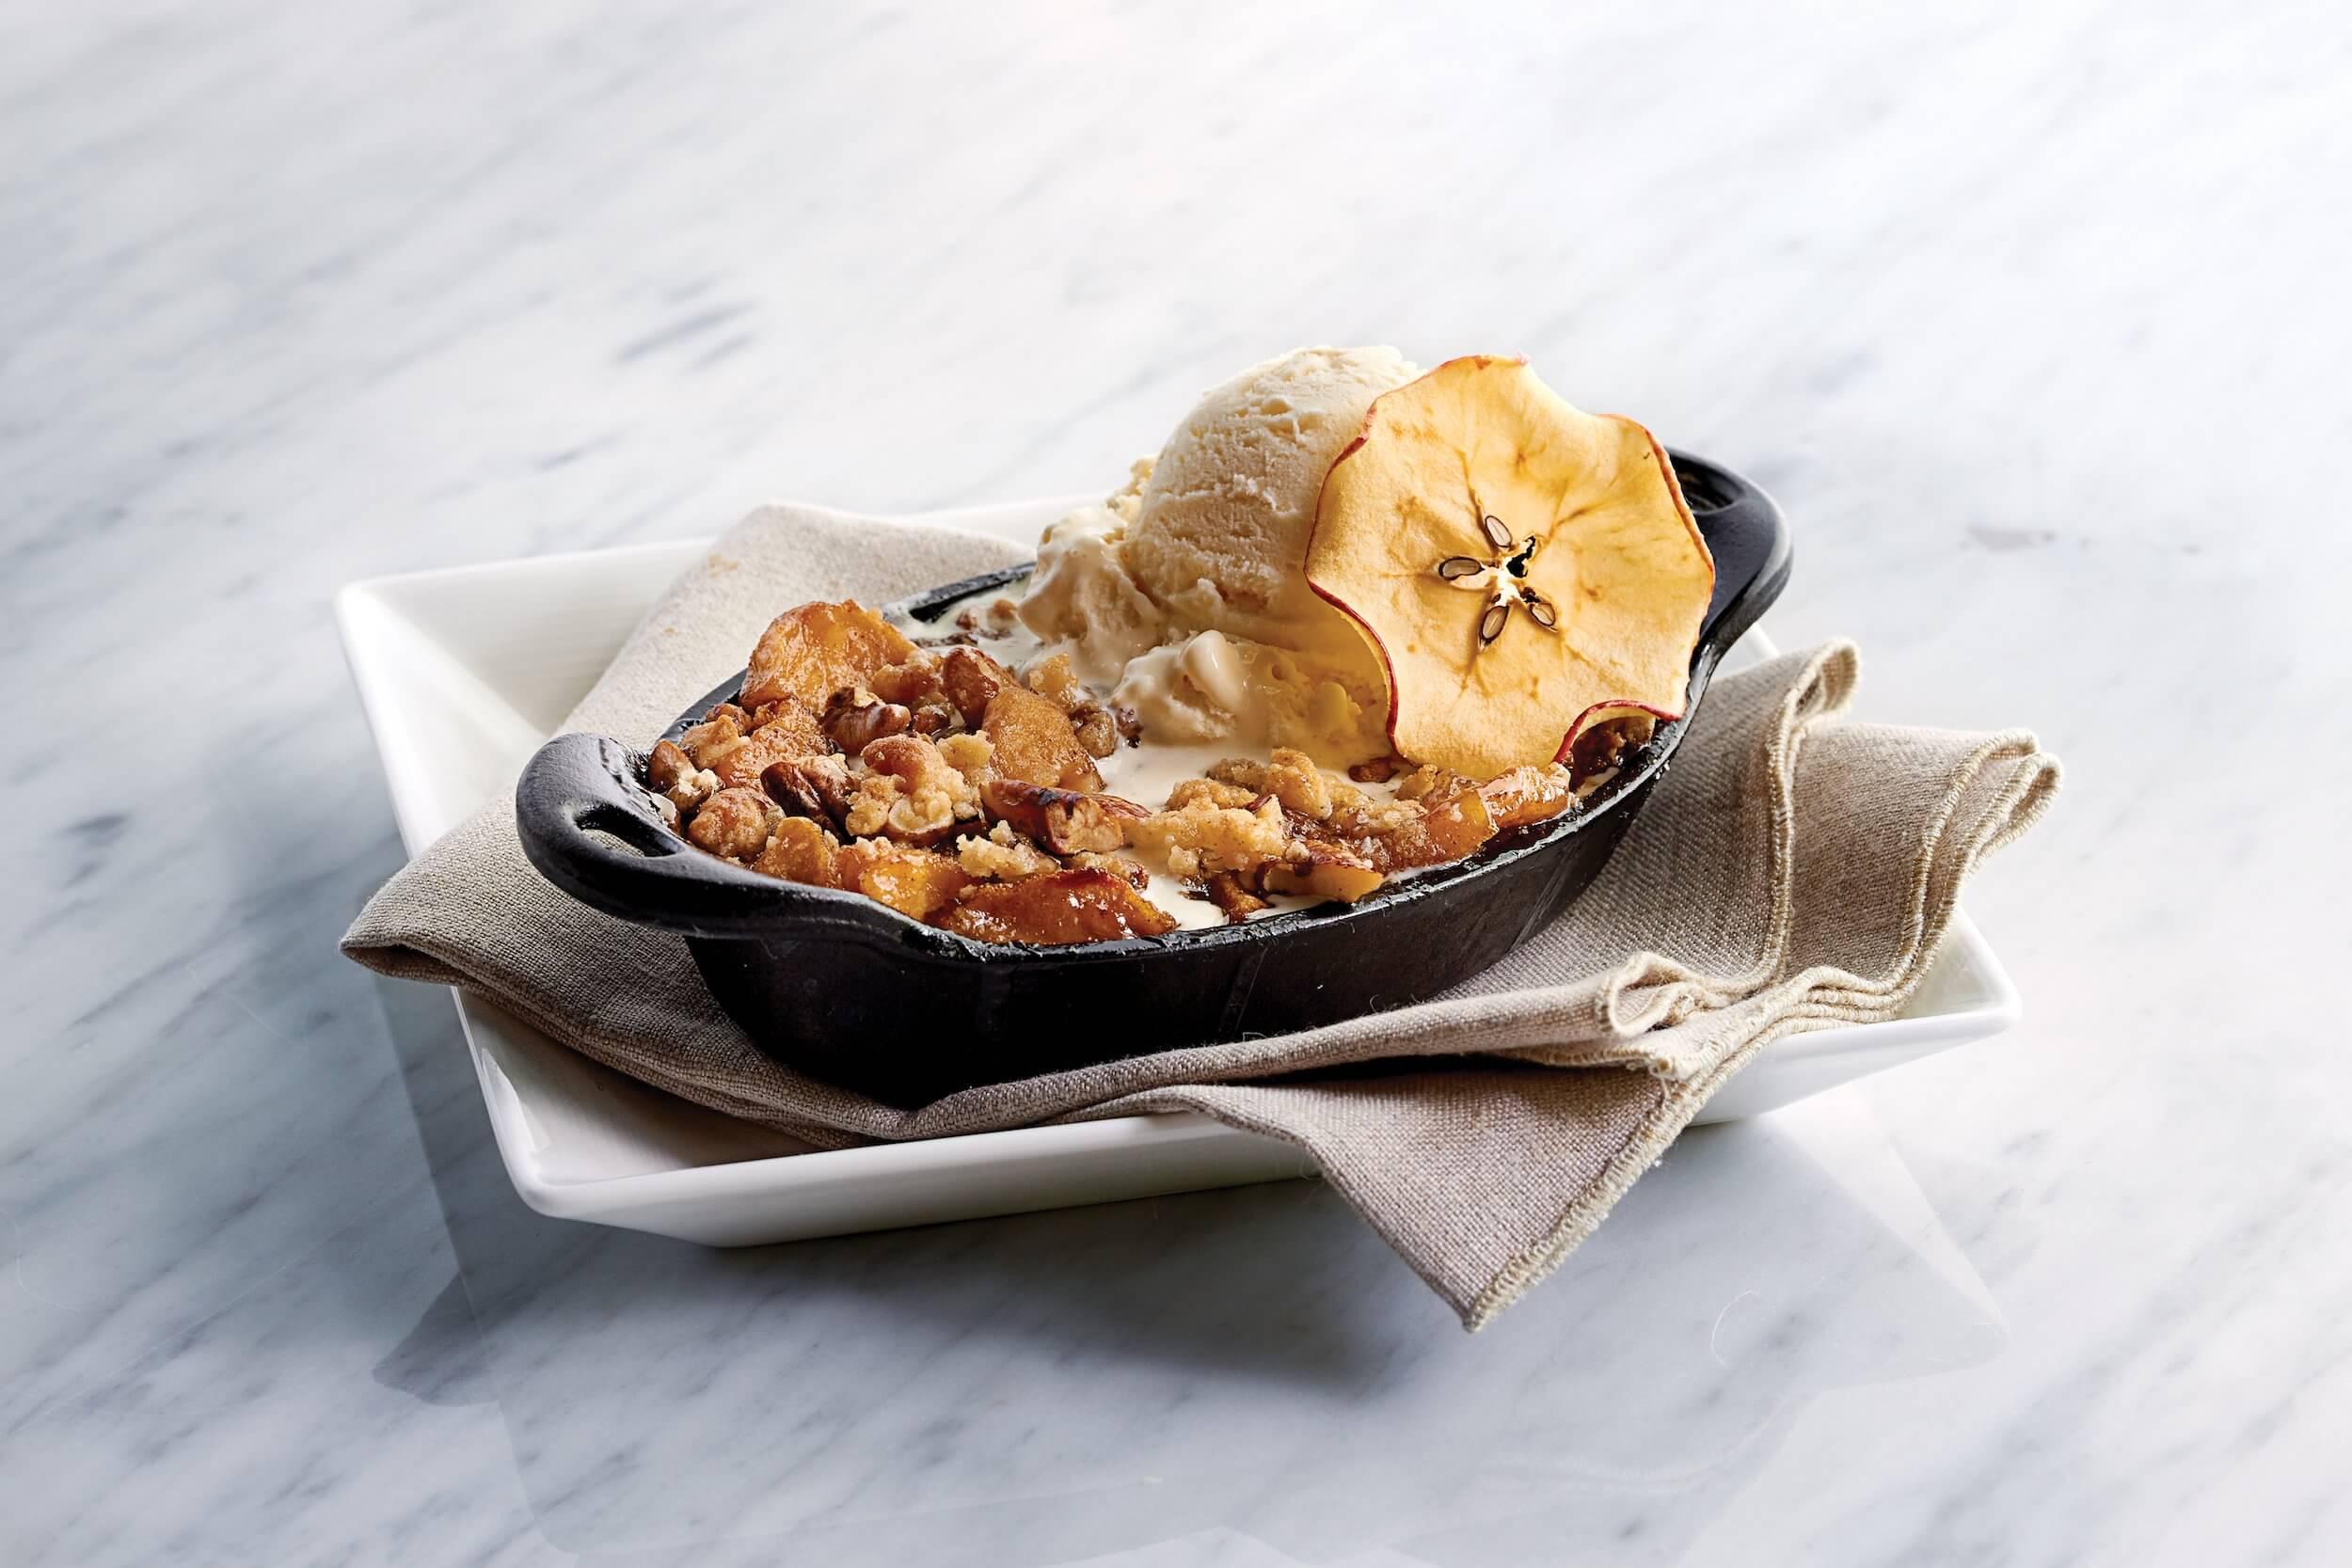 Apple tart with cinnamon ice cream.